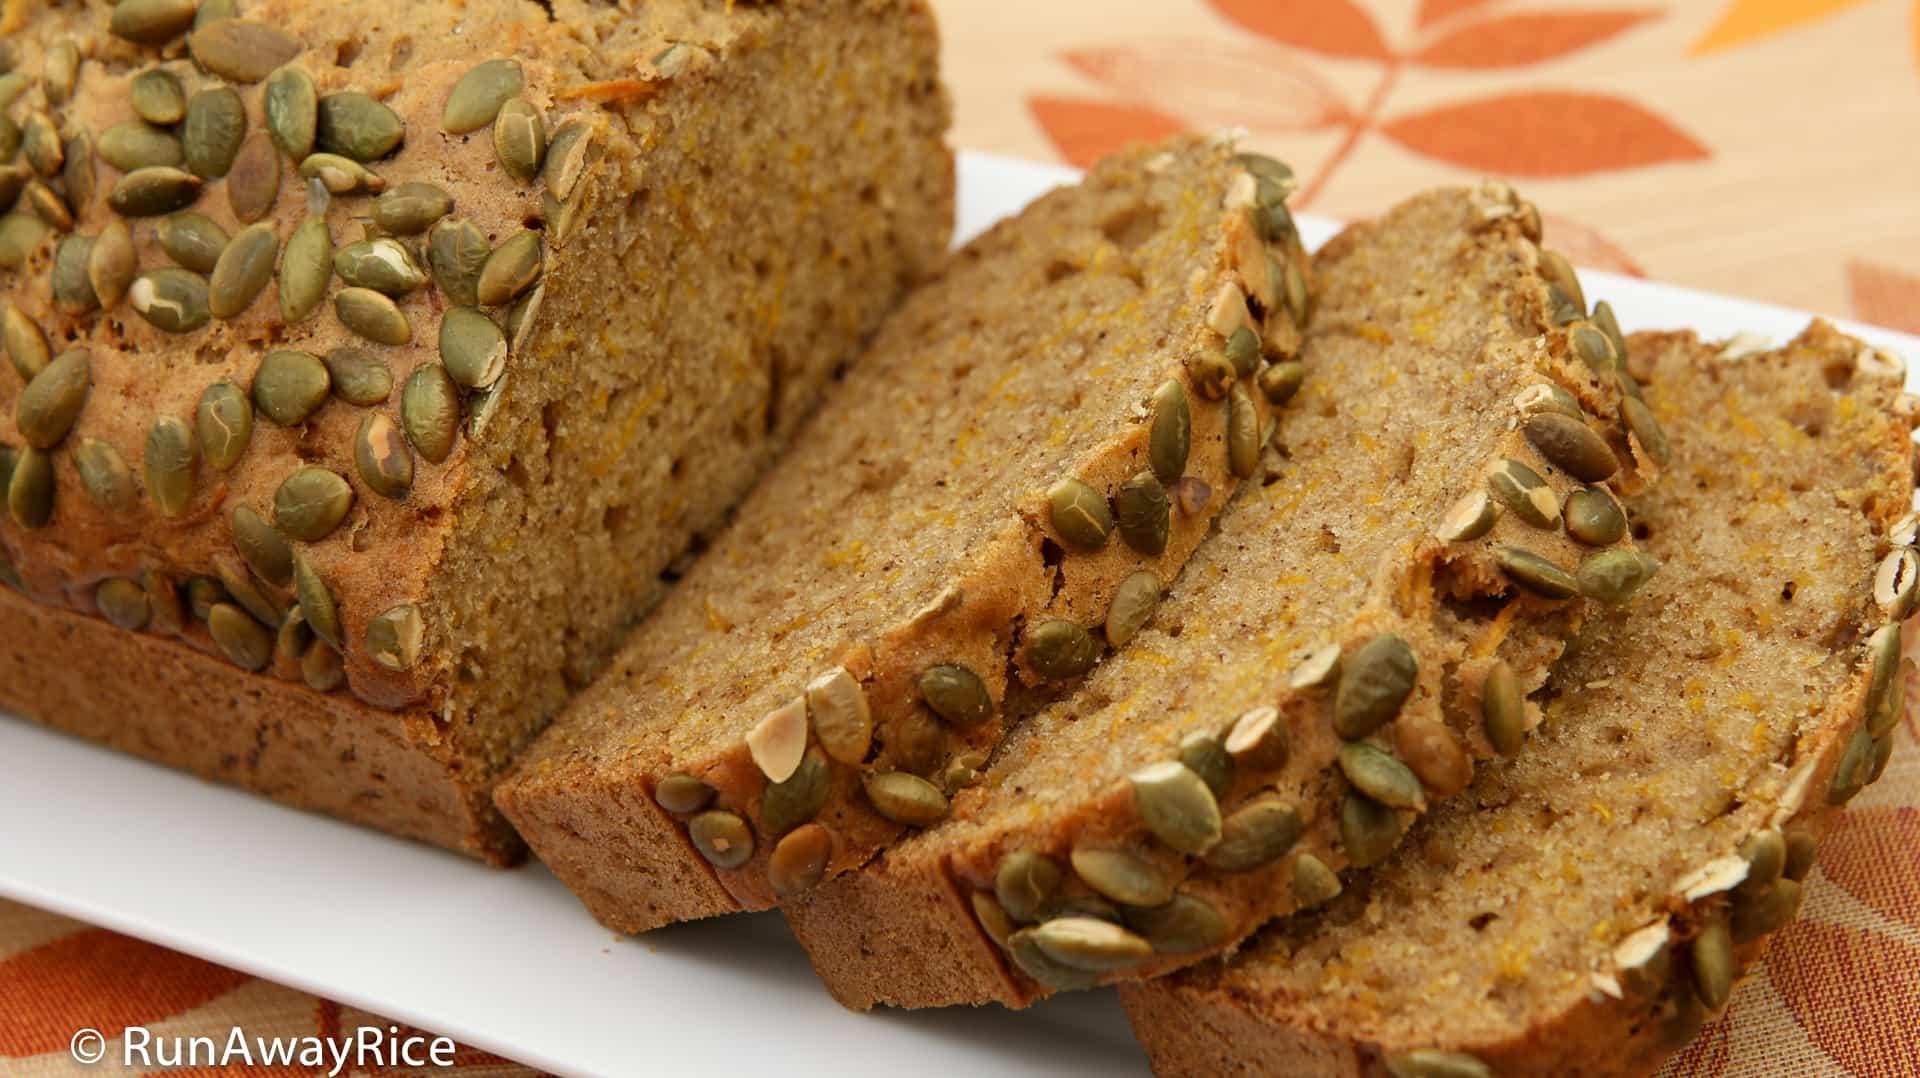 Pumpkin Spice Bread with Fresh Pumpkin - Easy Recipe and Video